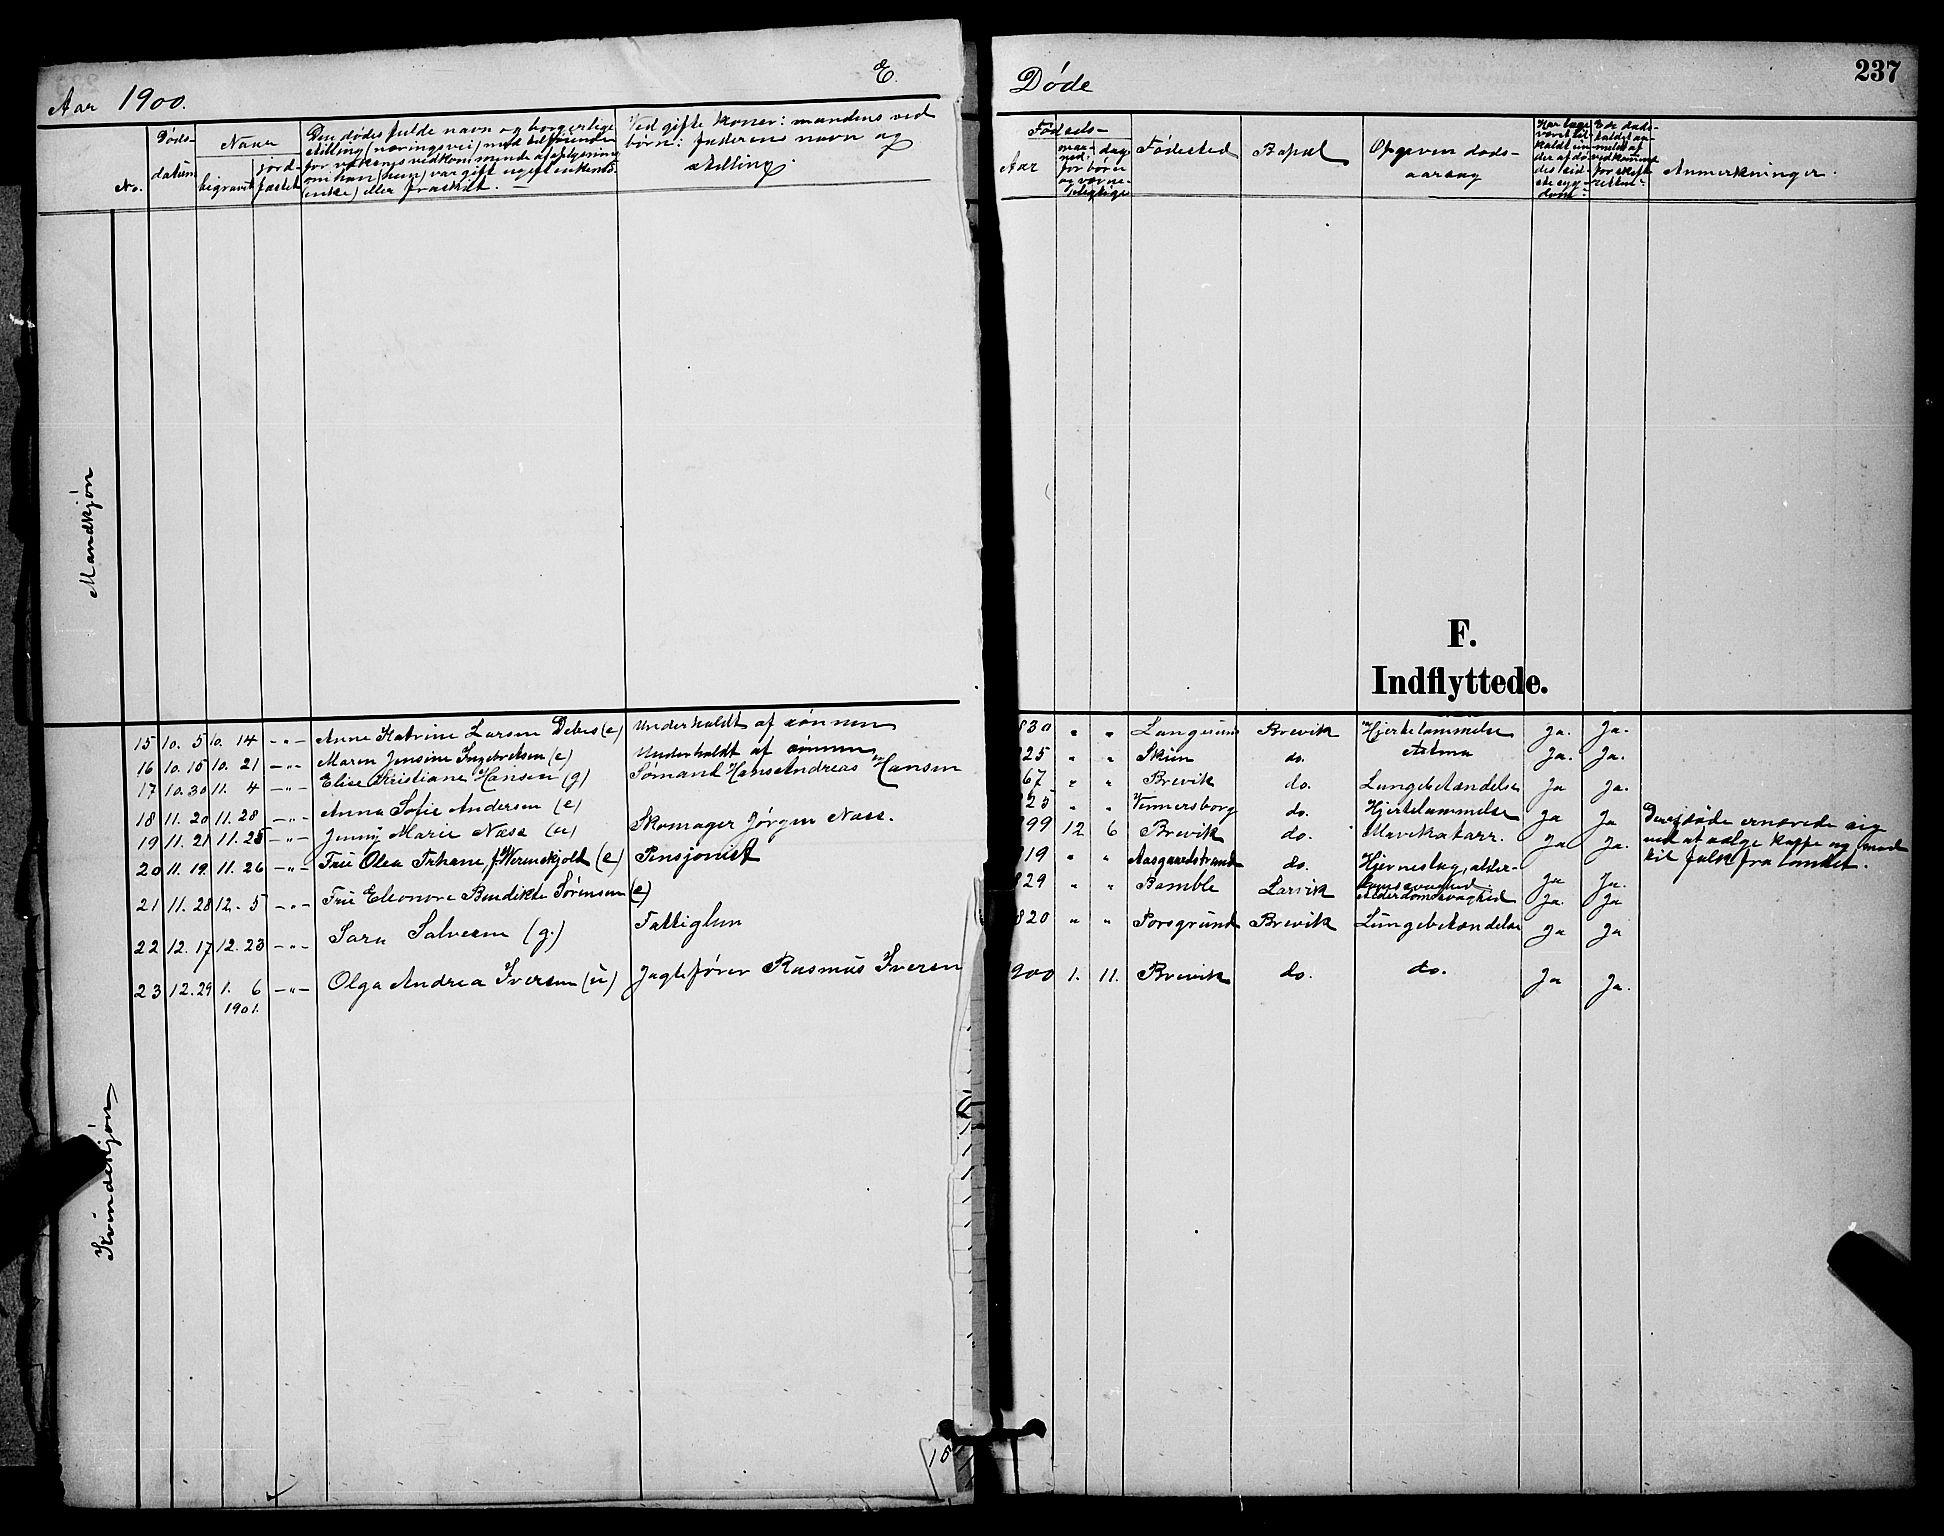 SAKO, Brevik kirkebøker, G/Ga/L0004: Klokkerbok nr. 4, 1882-1900, s. 237